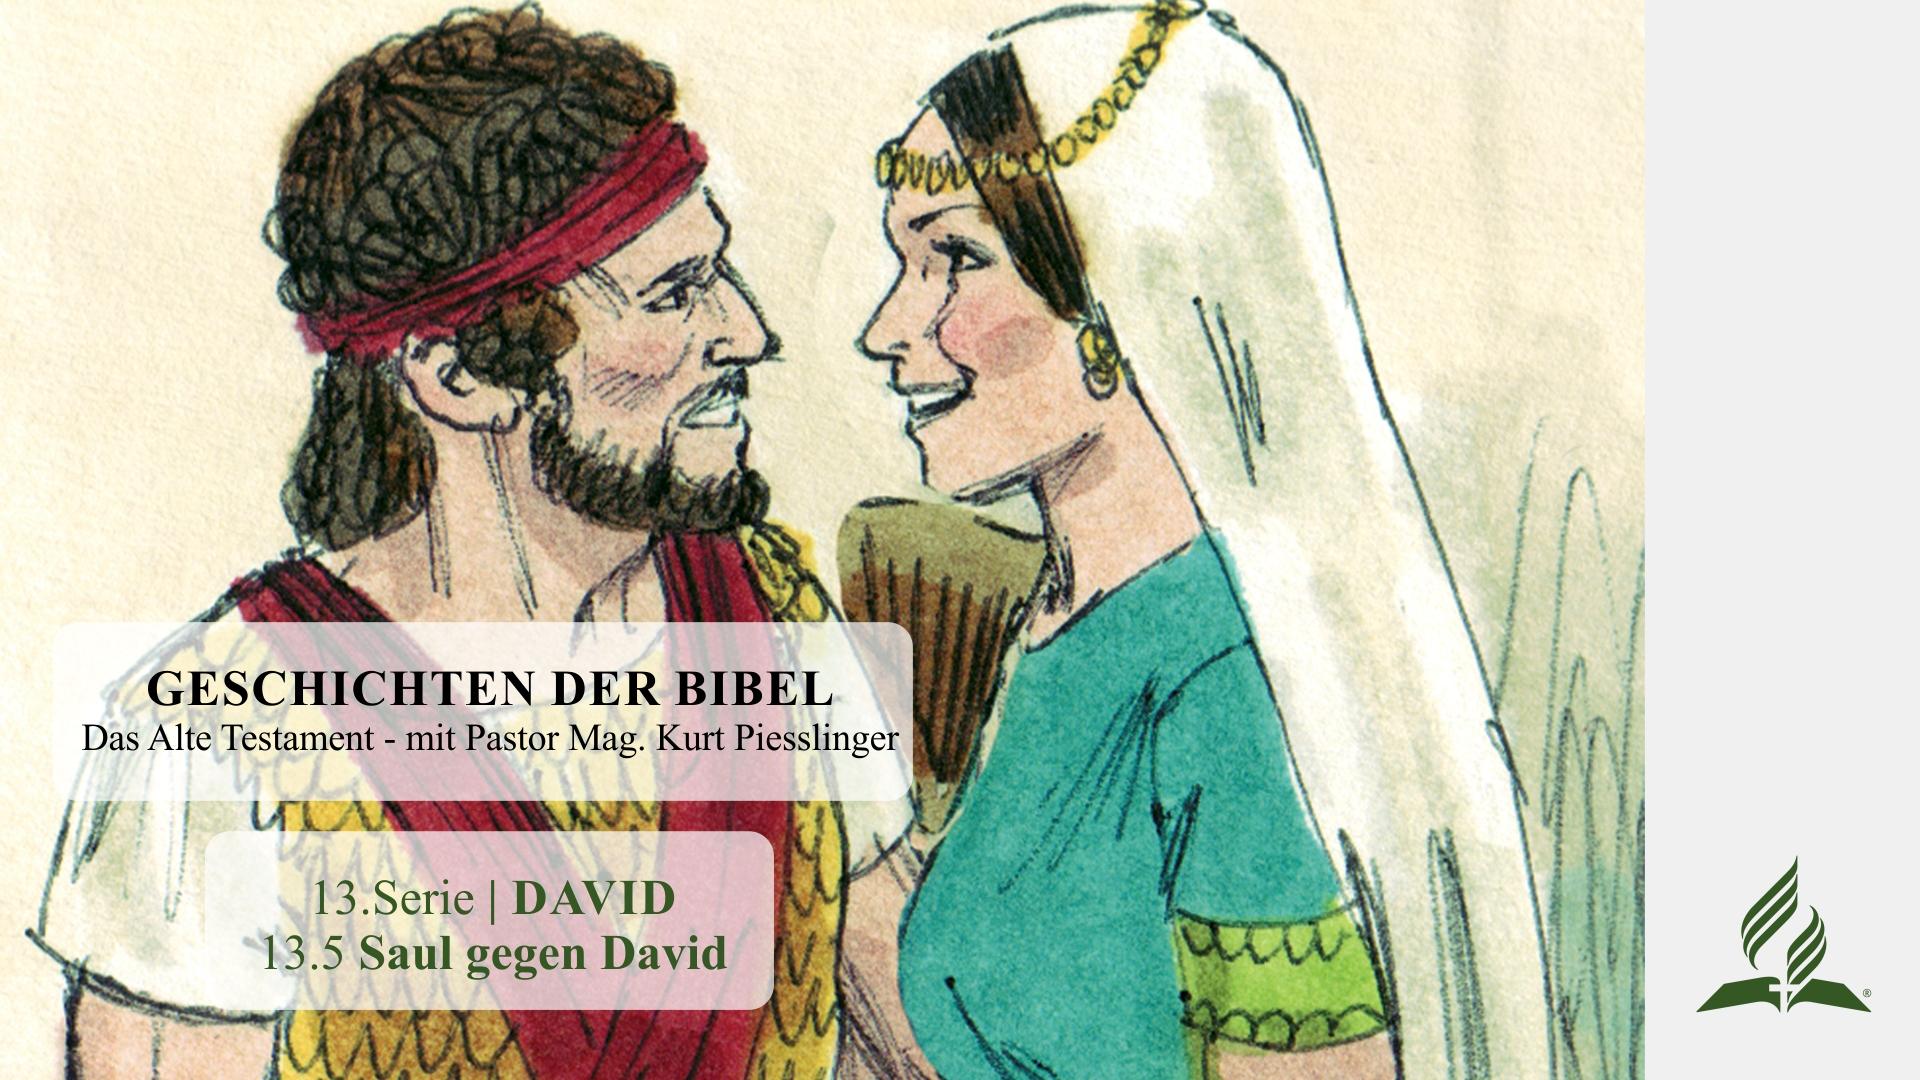 13.5 Saul gegen David x